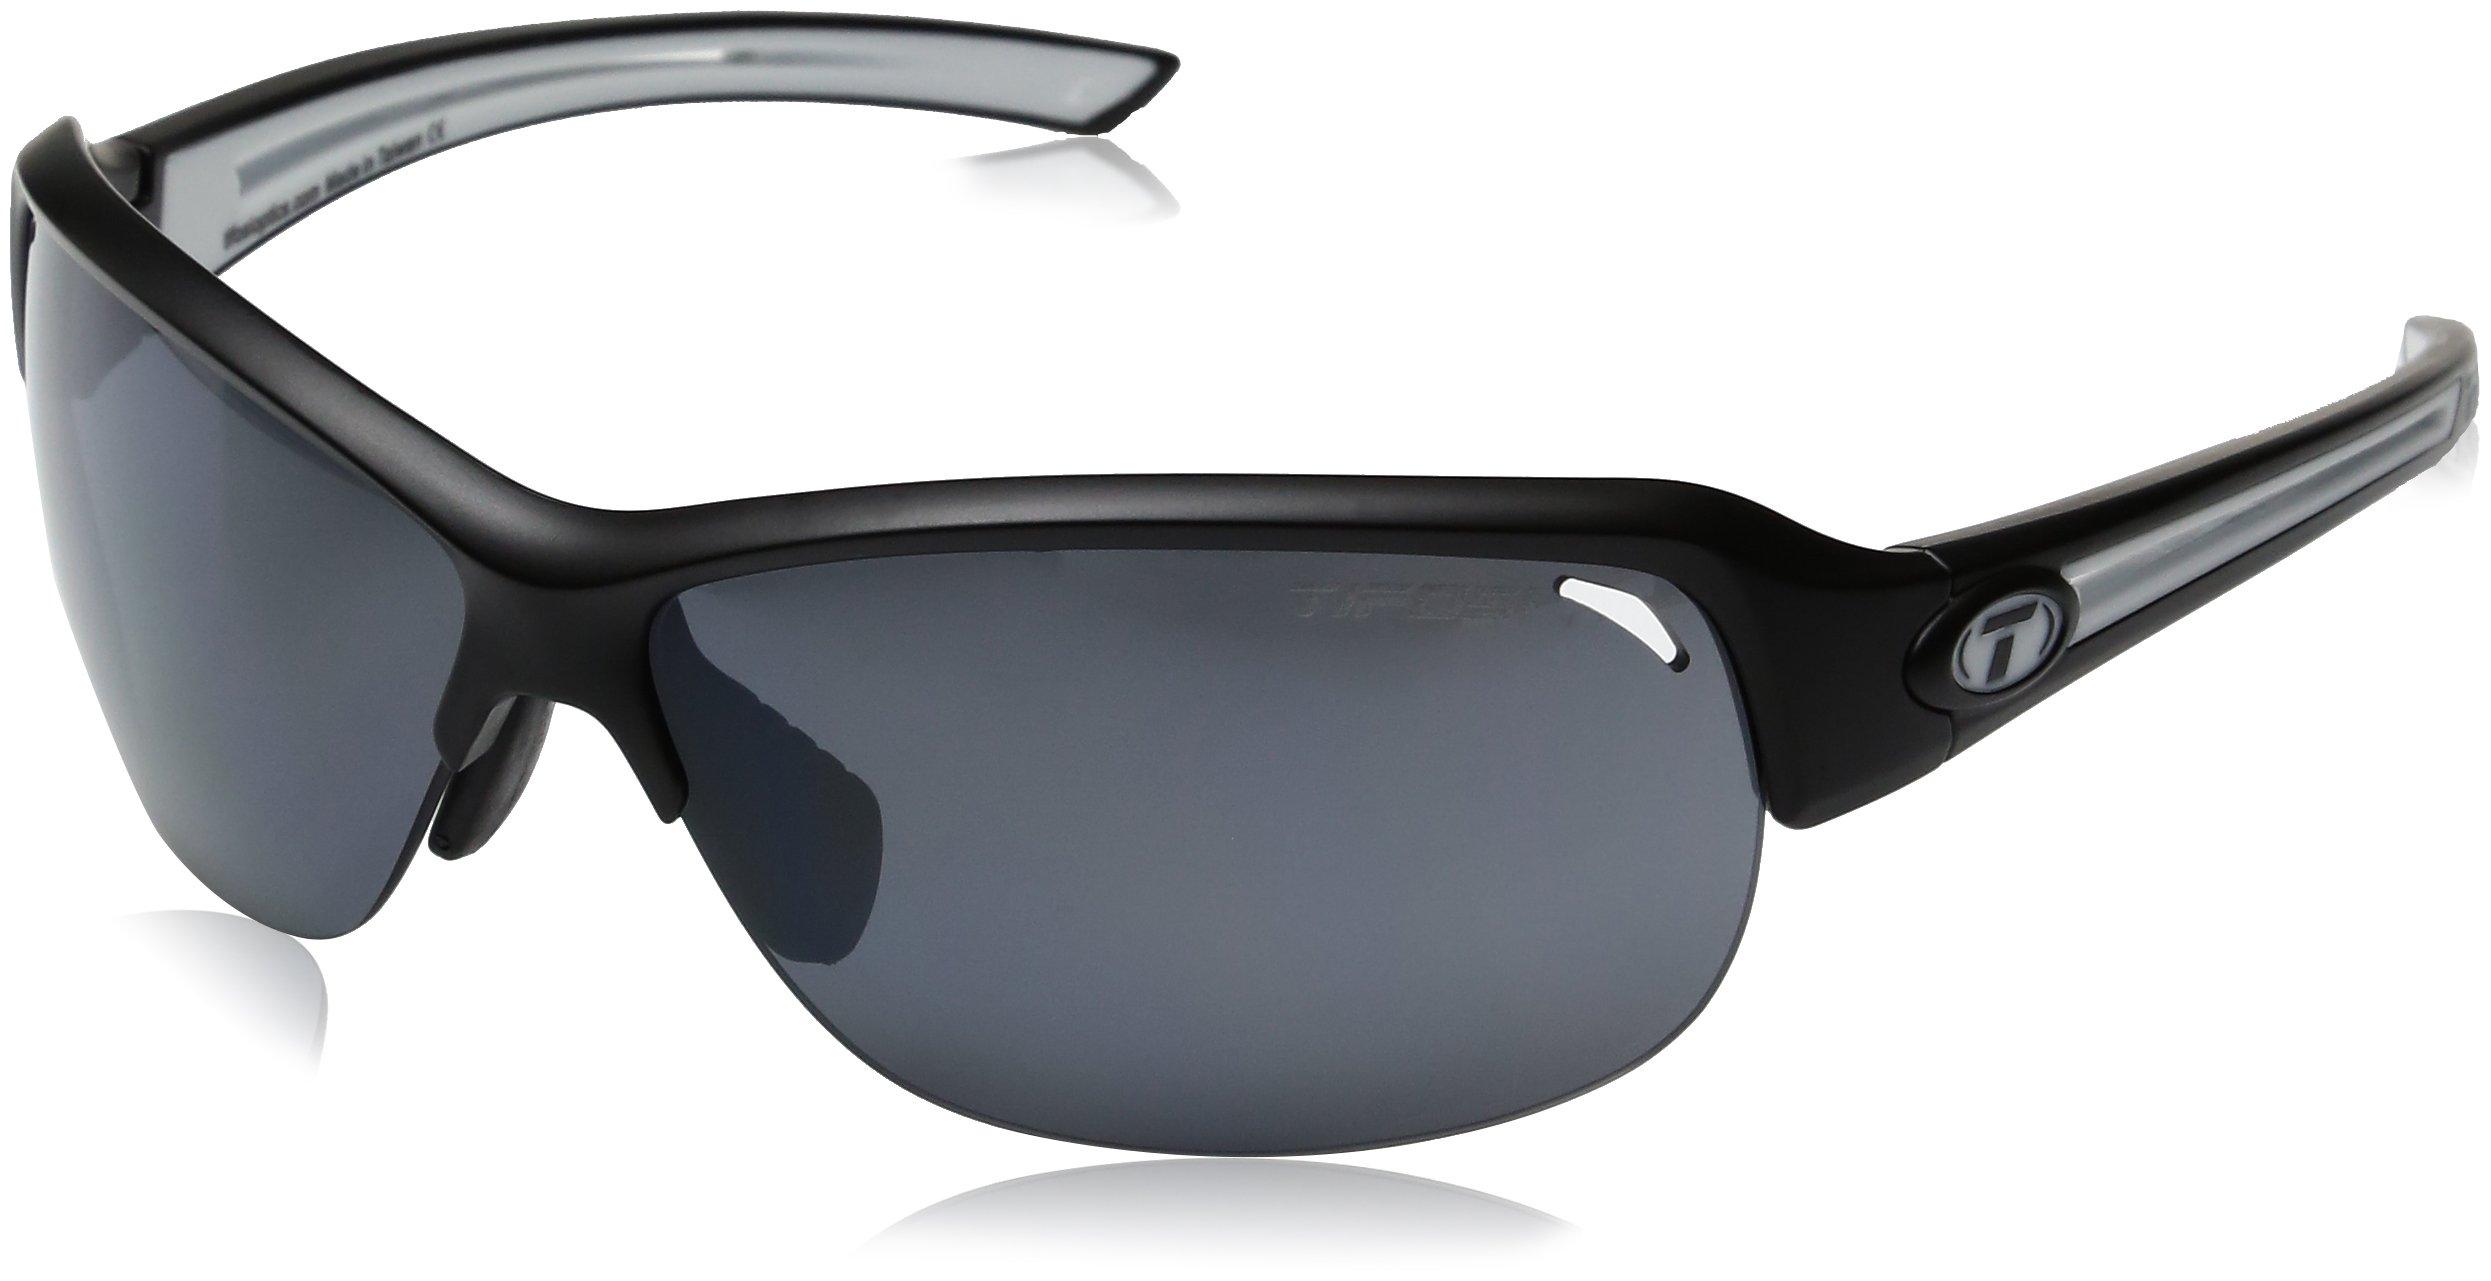 Tifosi Wrap Mira Black/White Single Lens Sunglasses, 142 mm